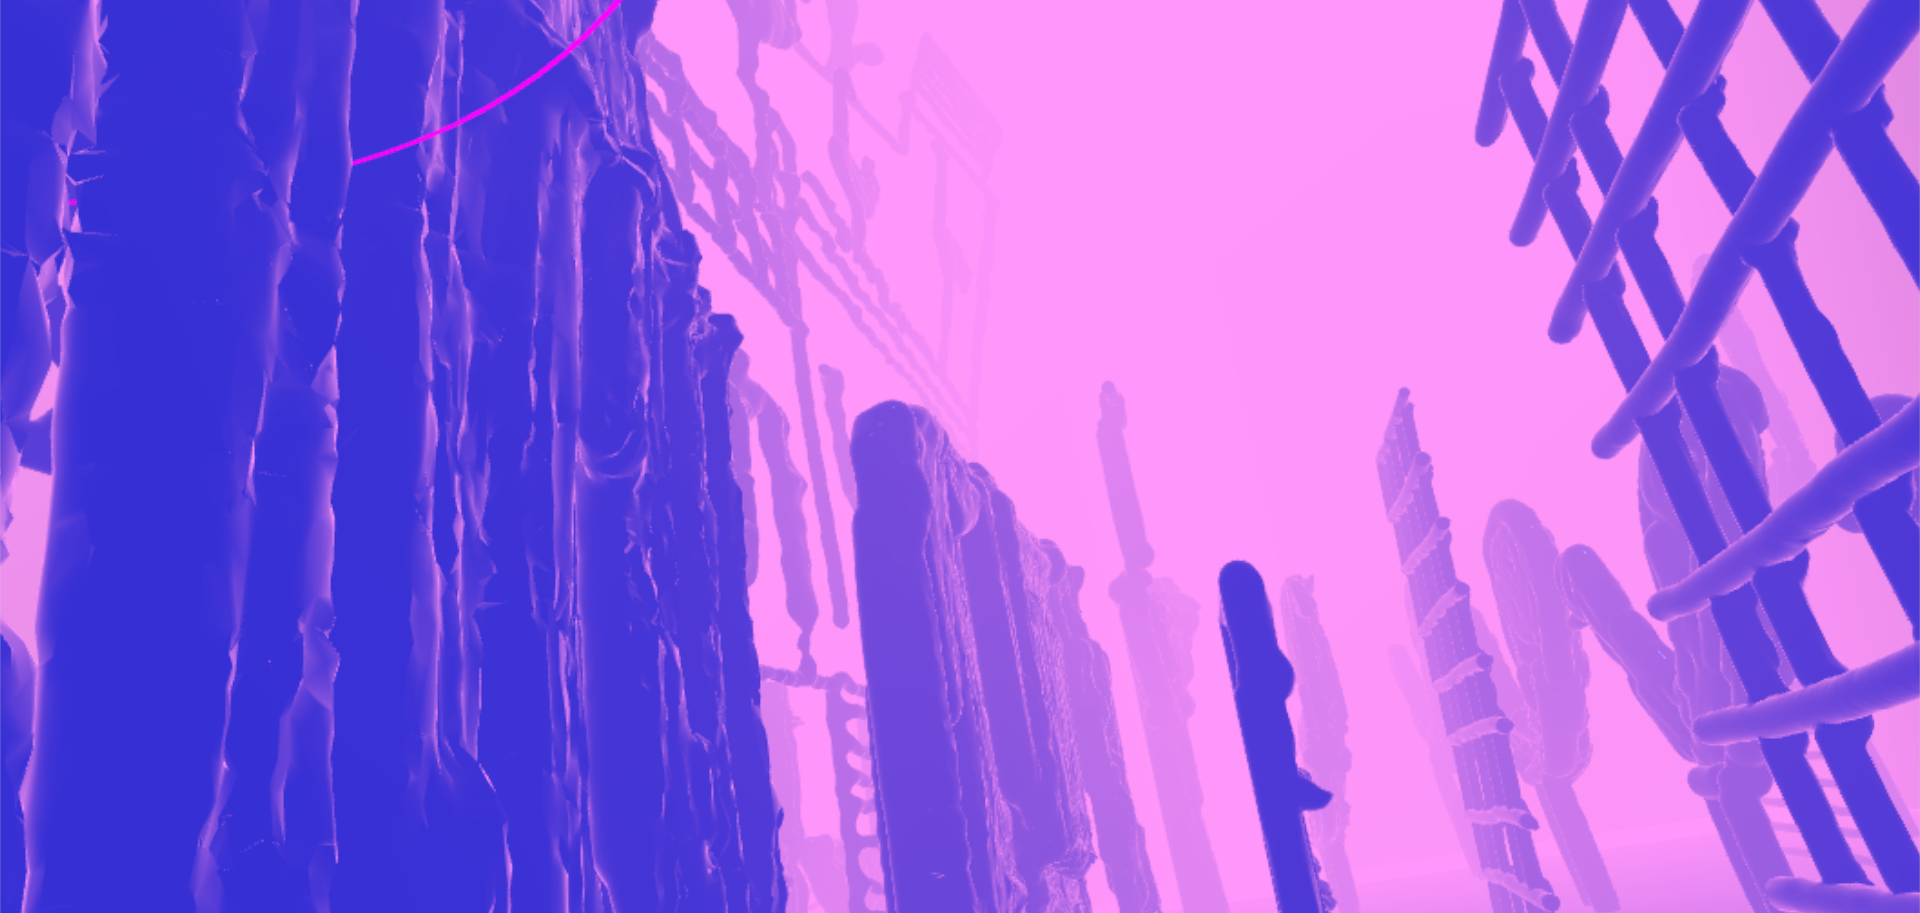 Unity 2018.1.0f2 Personal (64bit) - WeepingAngel2.unity - MazeForArtists - PC, Mac _ Linux Standalone _DX11_ 8_17_2018 10_33_39 AM.png